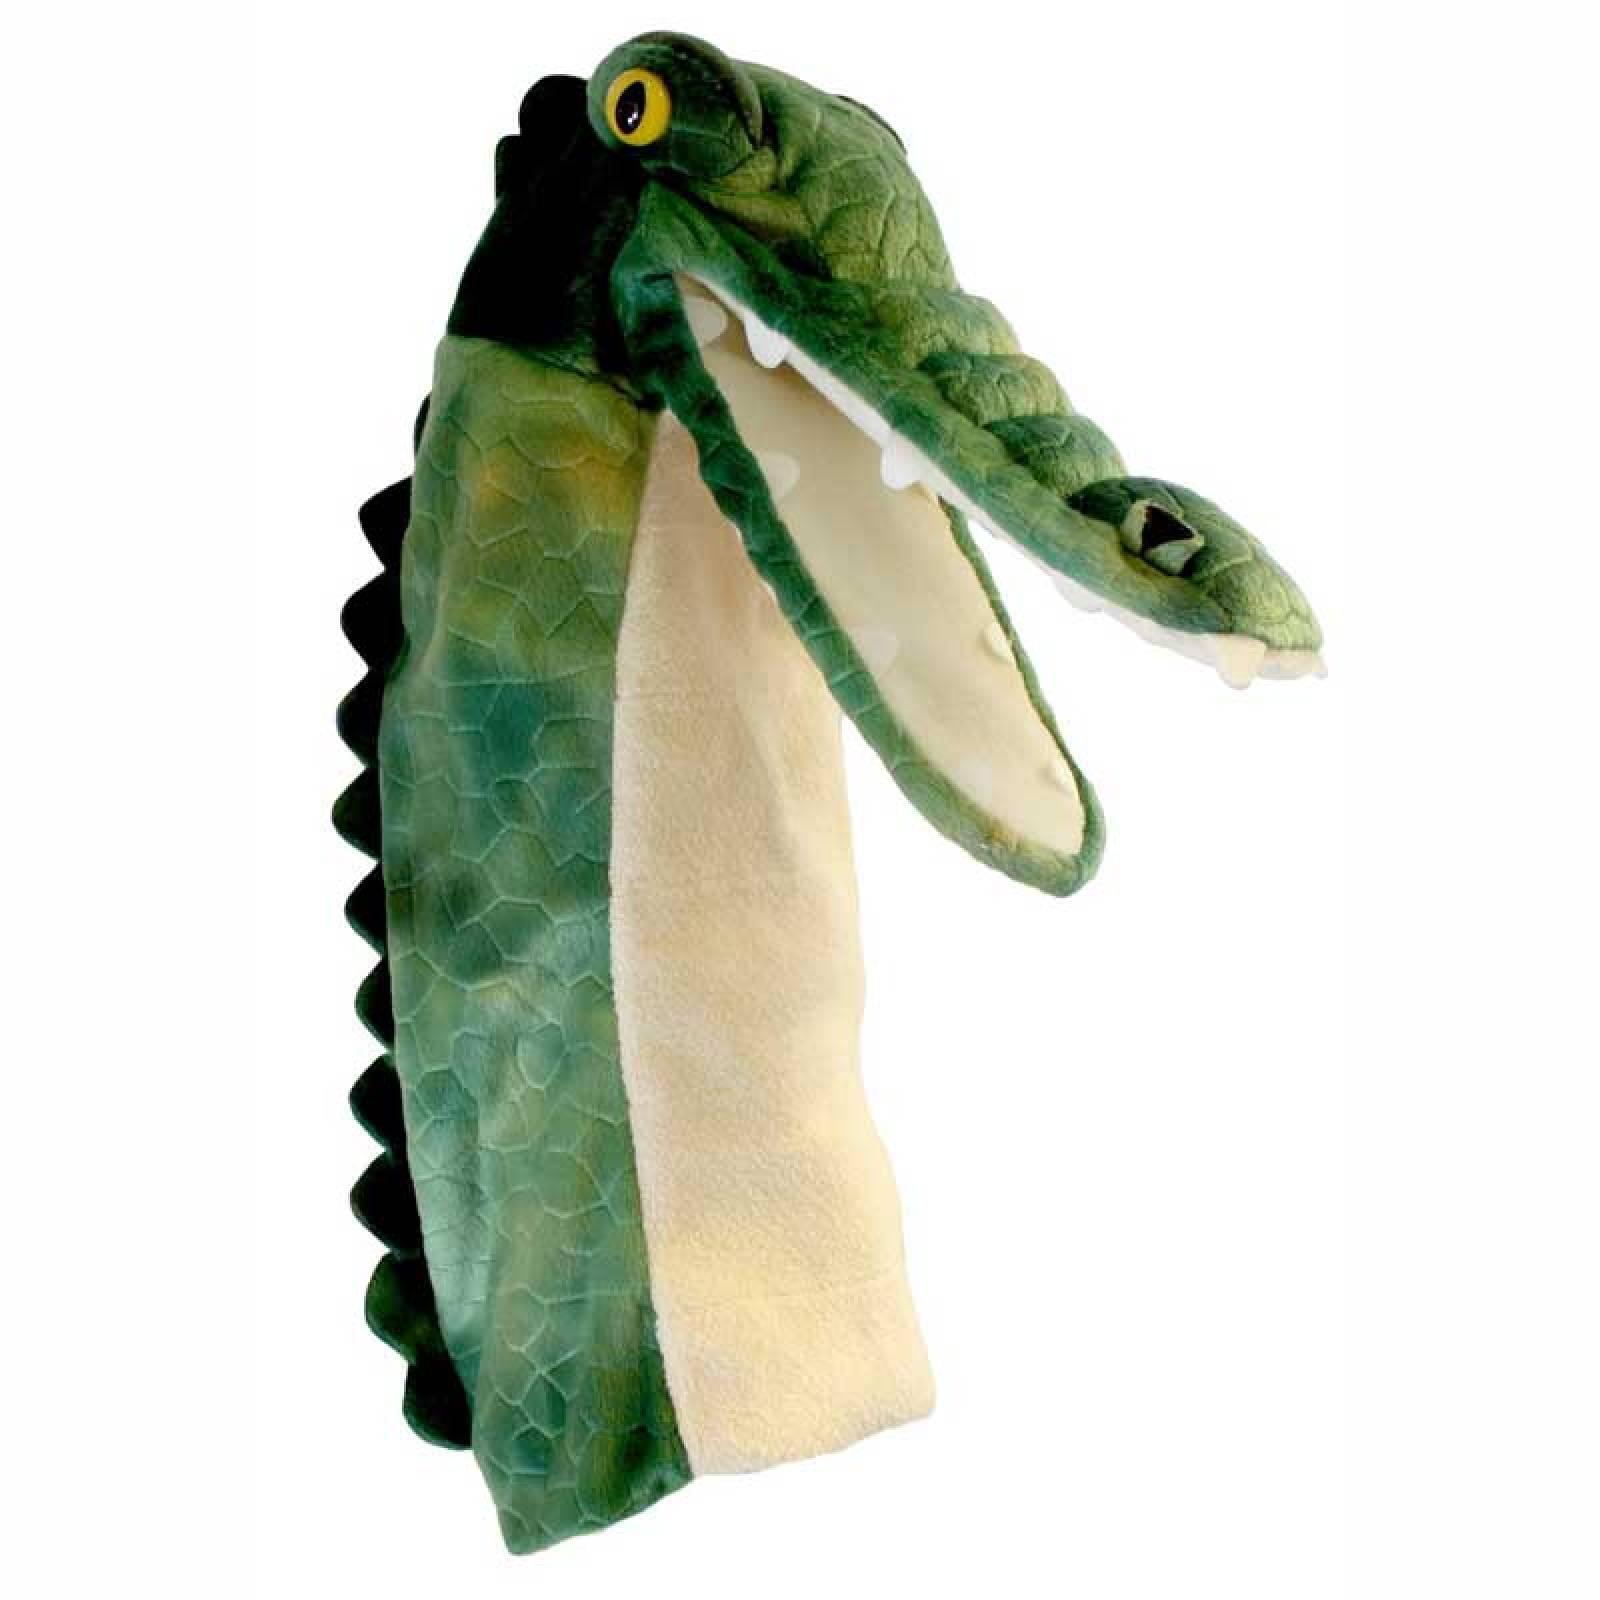 Crocodile Long Sleeved Glove Puppet